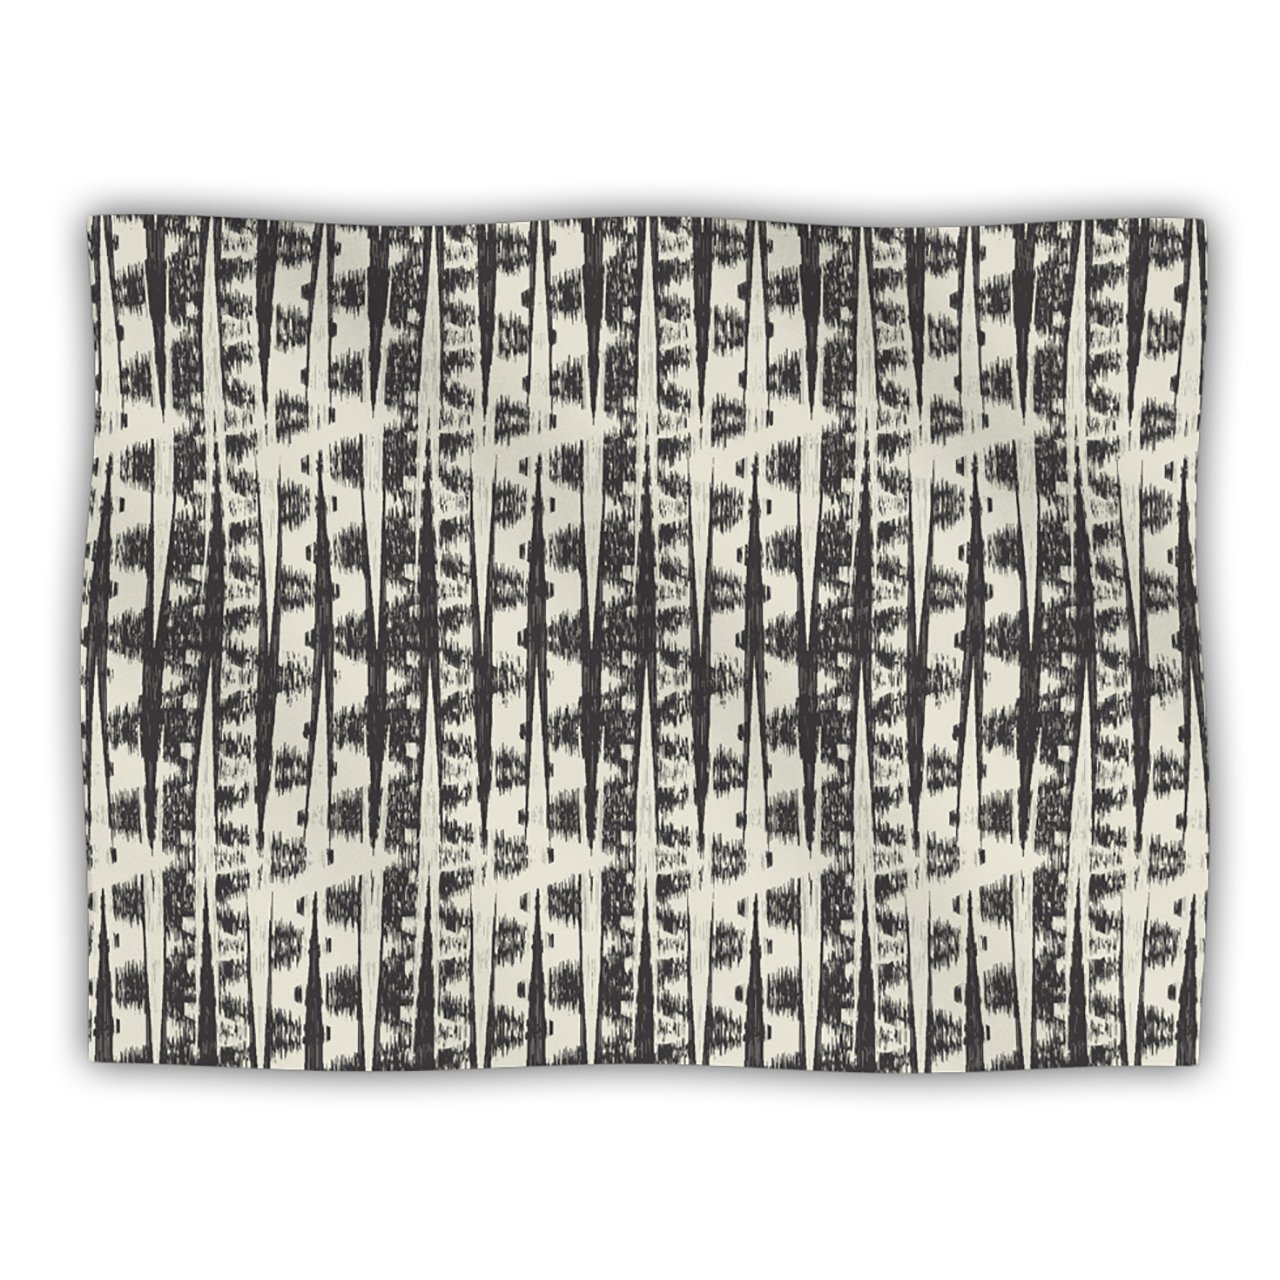 Kess InHouse Amanda Lane Black Cream Abstract Pet Blanket, 40 by 30-Inch